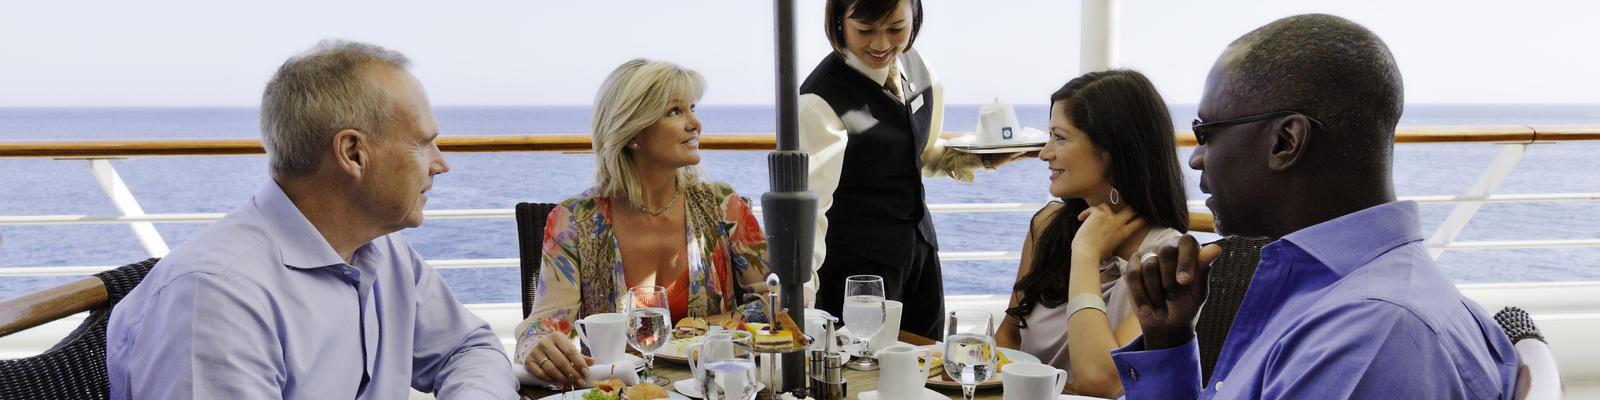 Dining on Azamara Quest (Photo: Azamara Club Cruises)